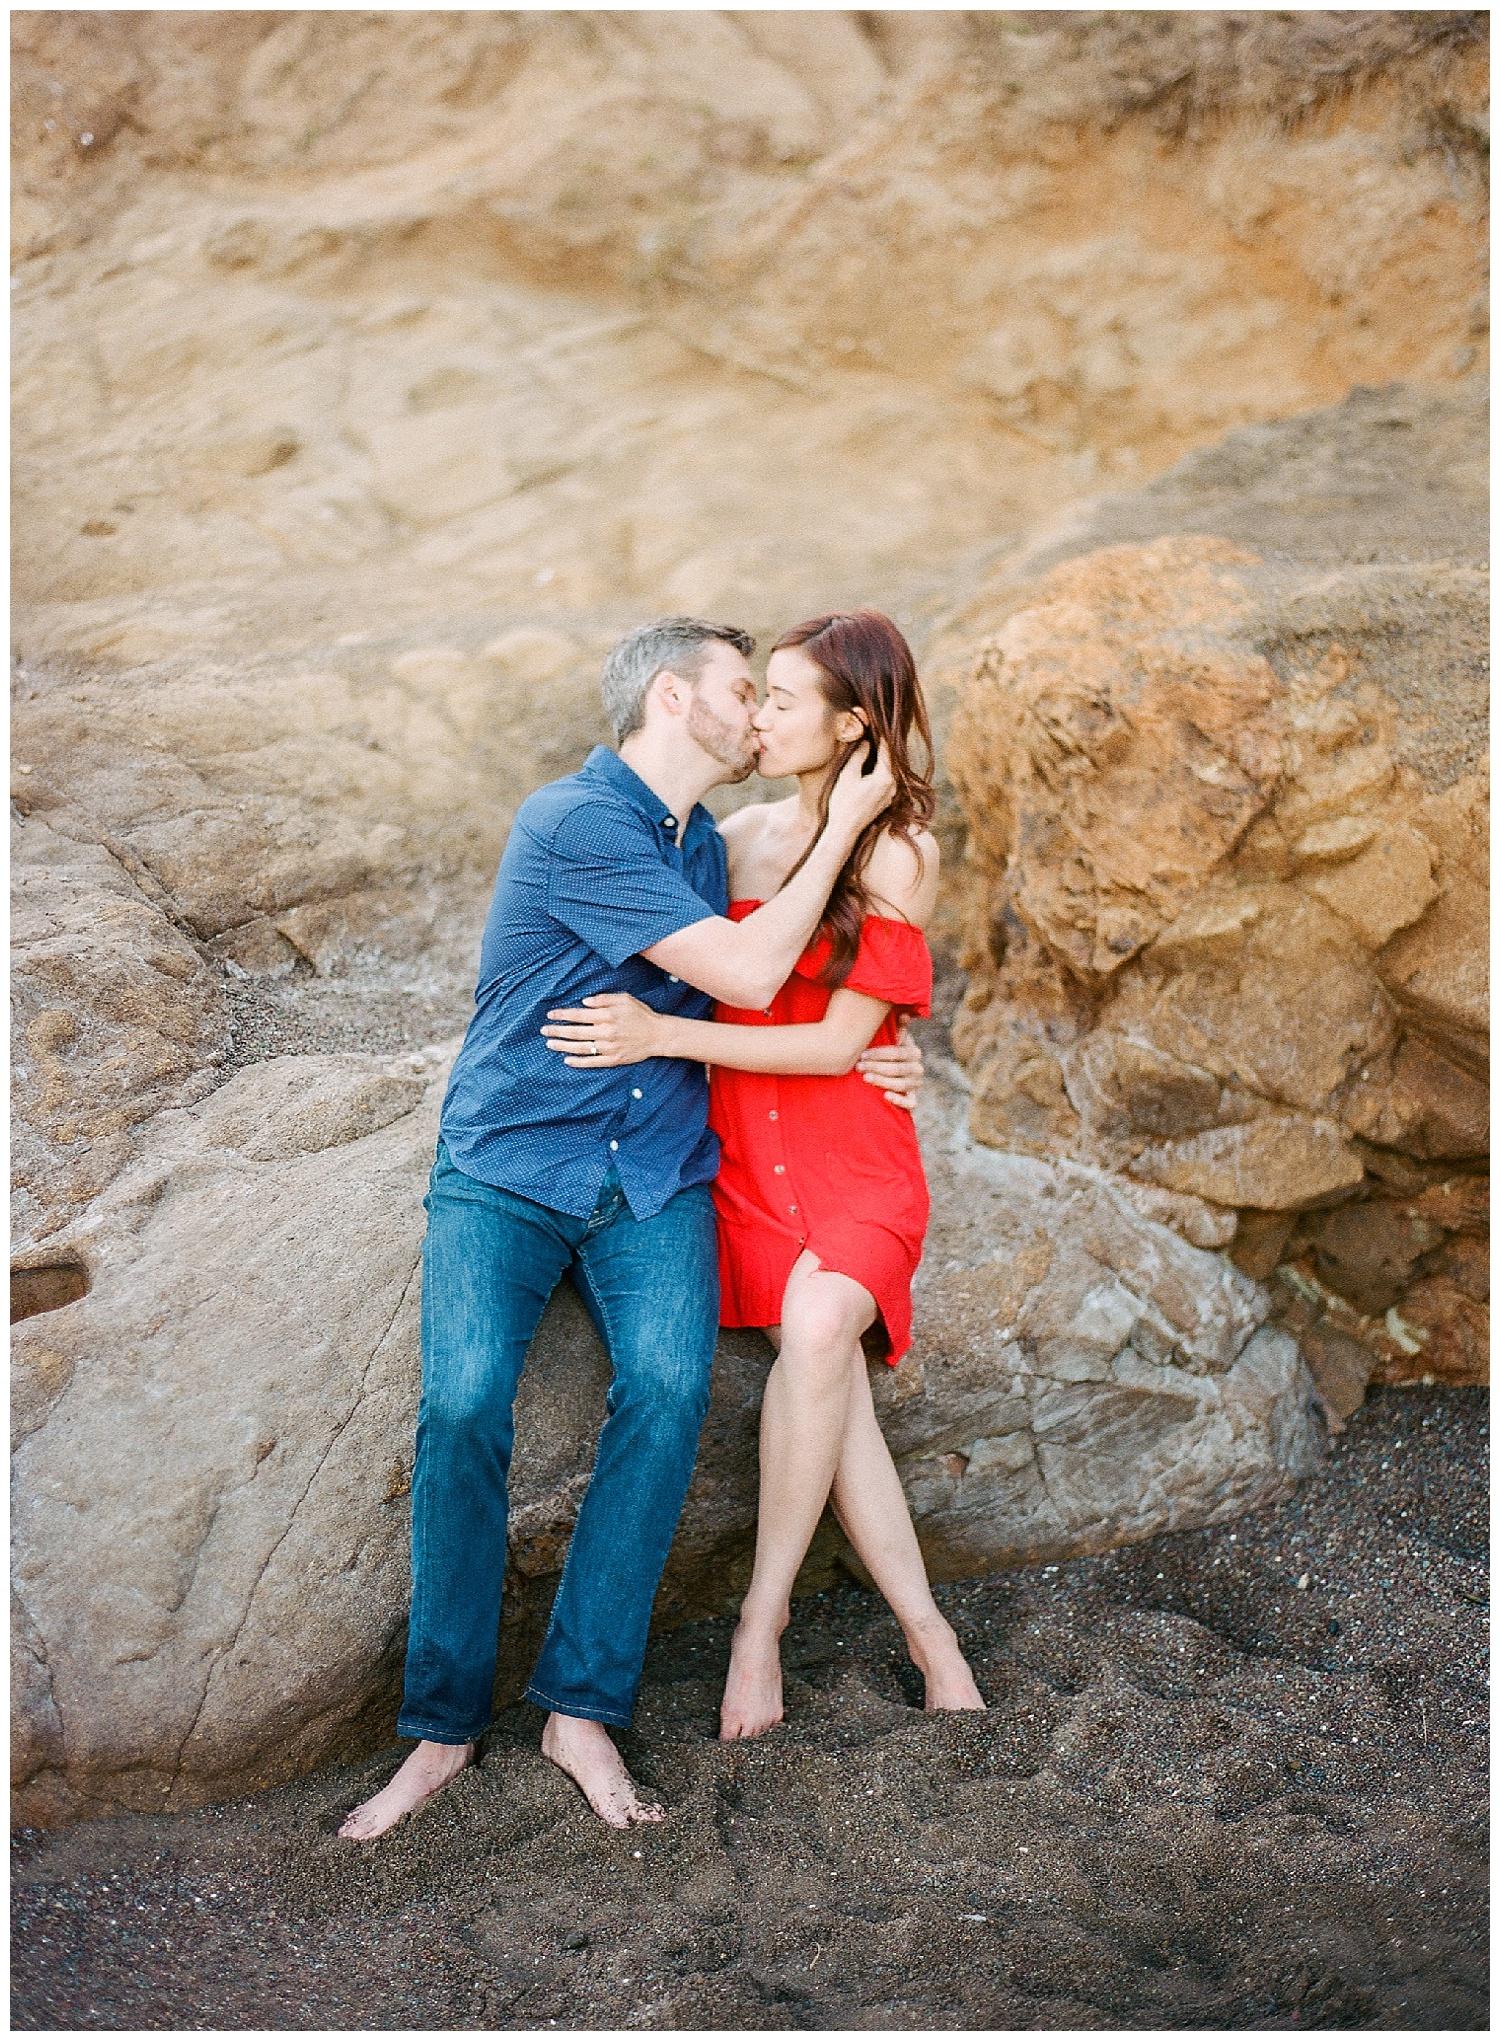 Janine_Licare_Photography_San_Francisco_Wedding_Photographer_0019.jpg